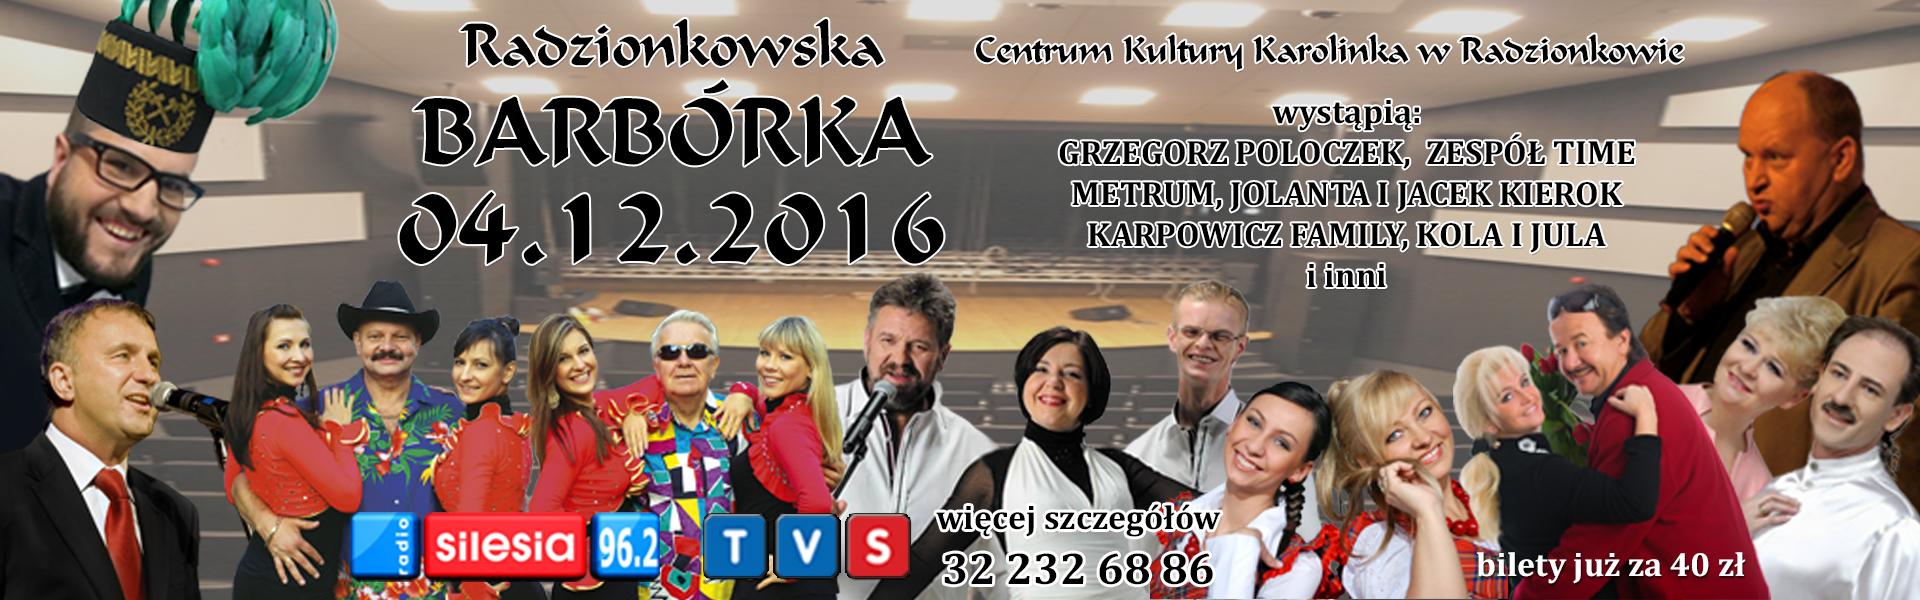 http://silesia.fm/wp-content/uploads/2016/10/www_Barb%C3%B3rka-z-Radiem-Silesia_i_TVS_.png